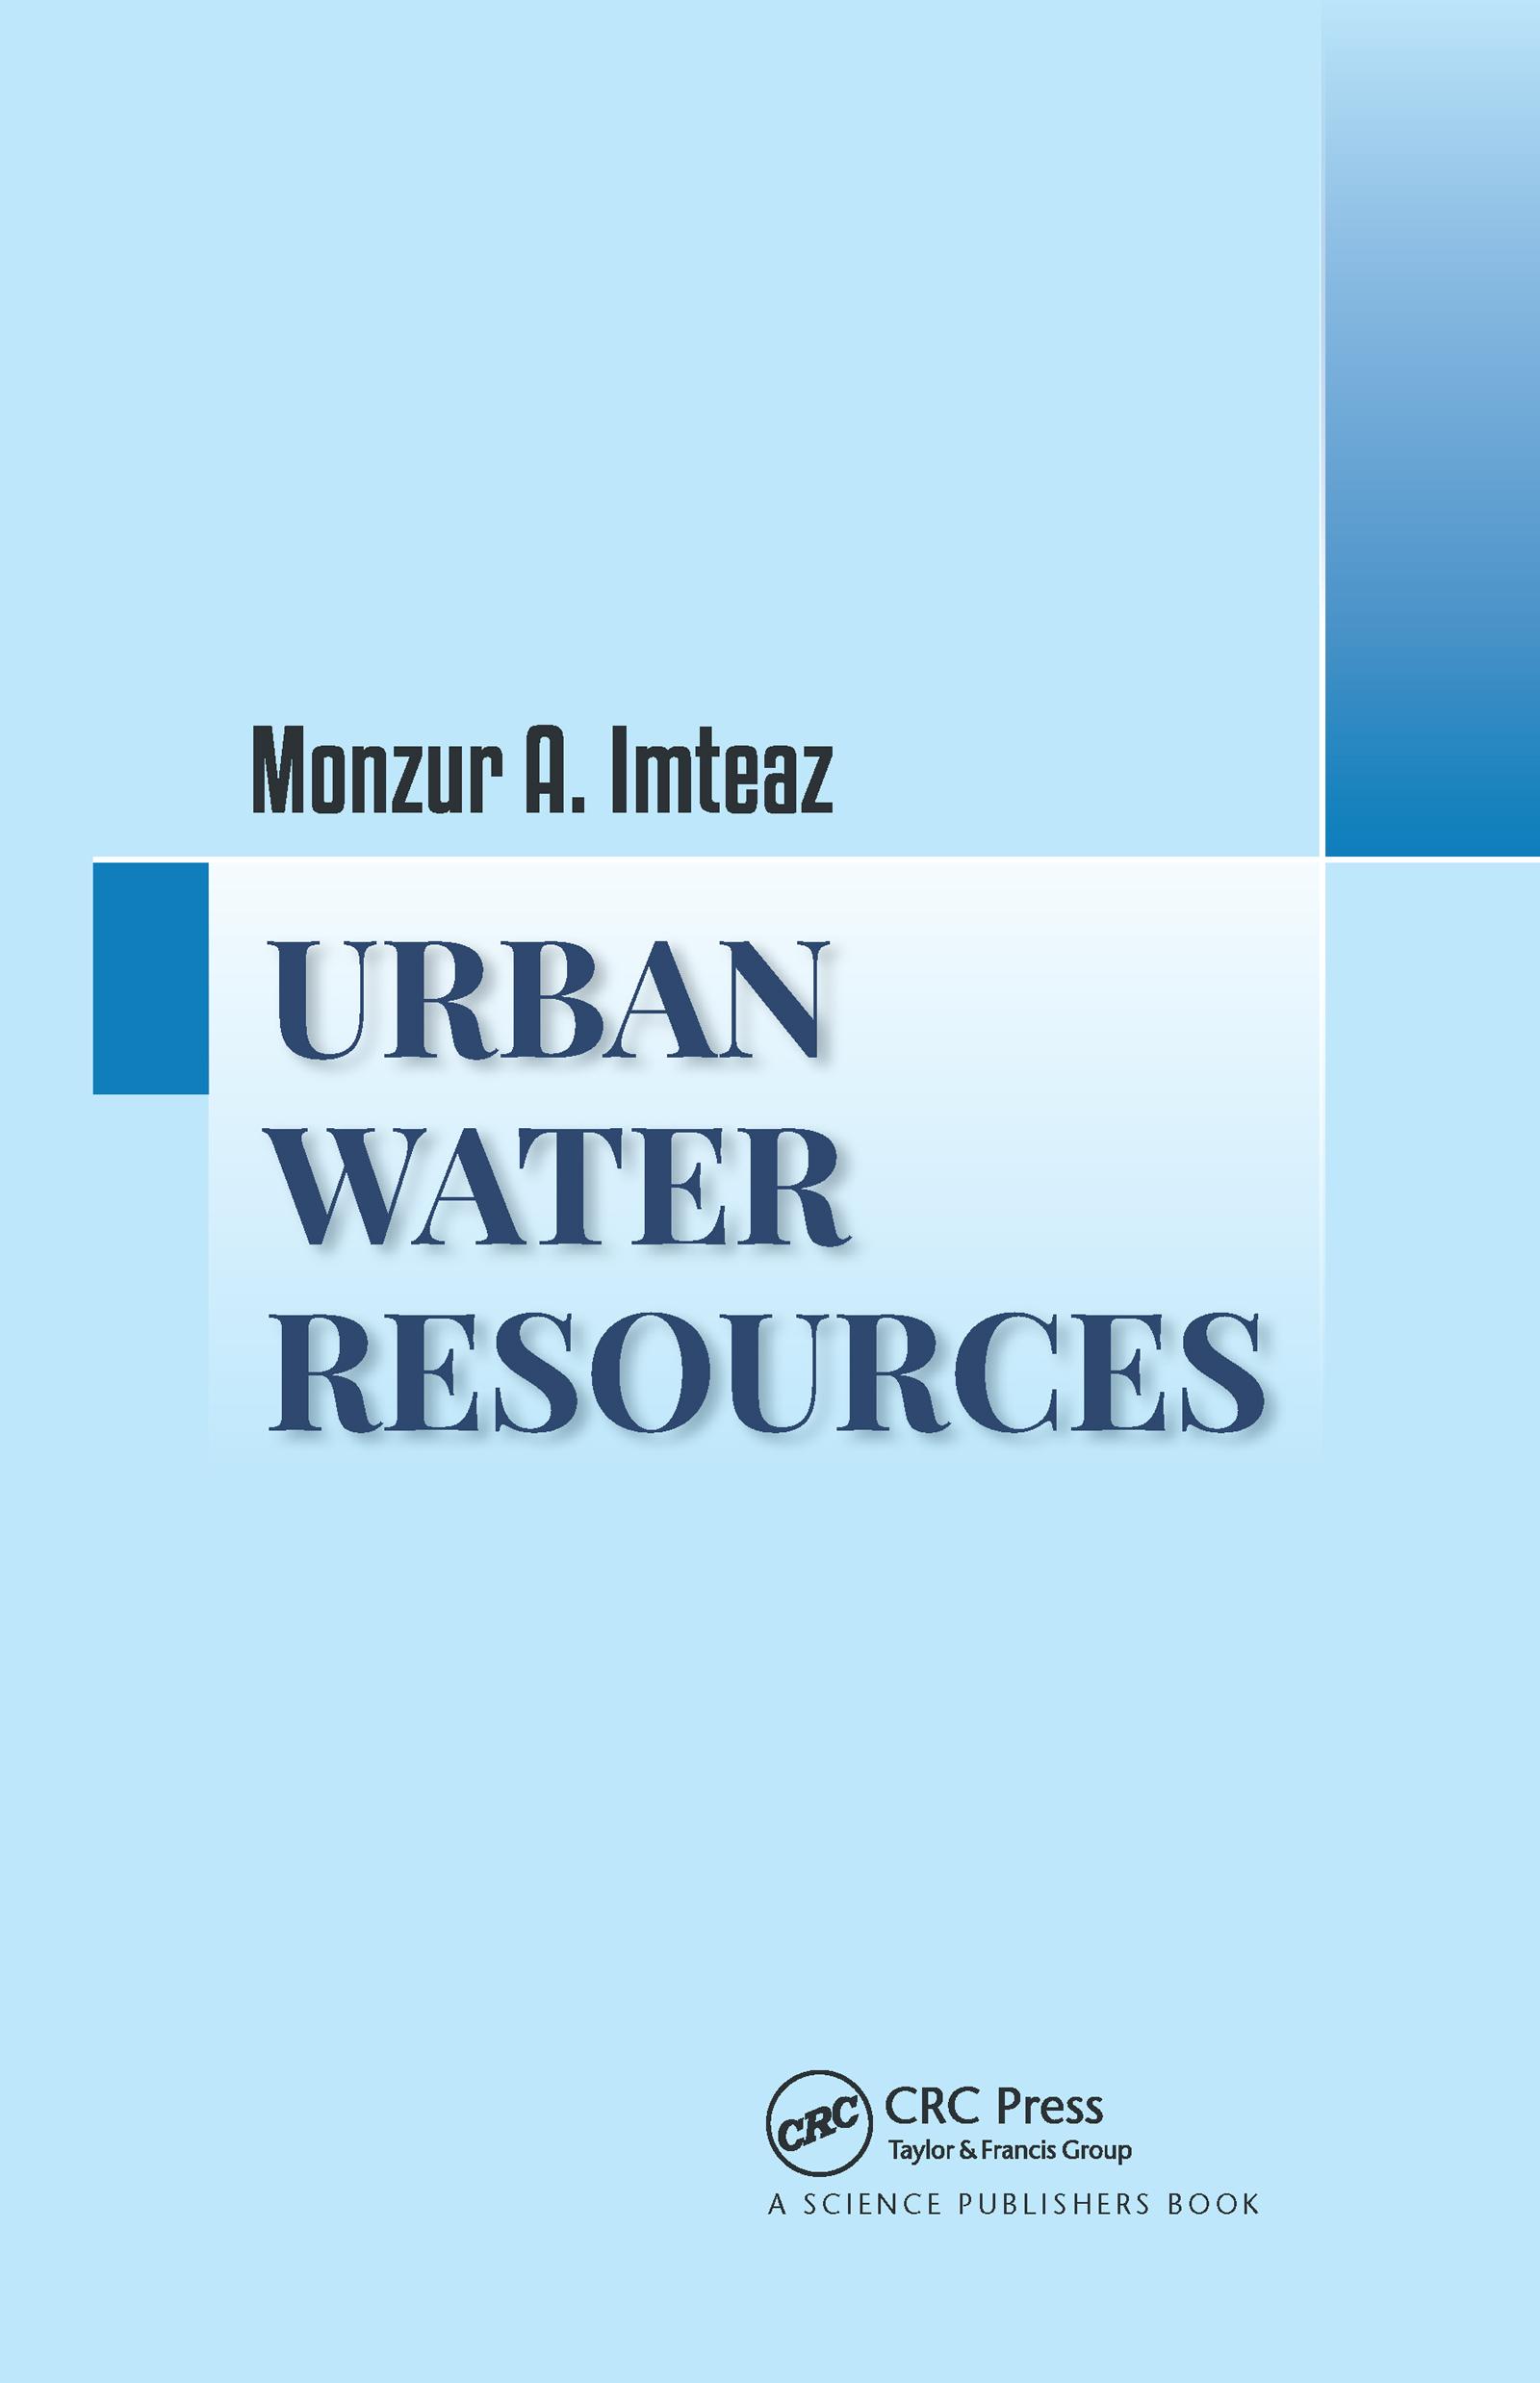 Urban Water Resources